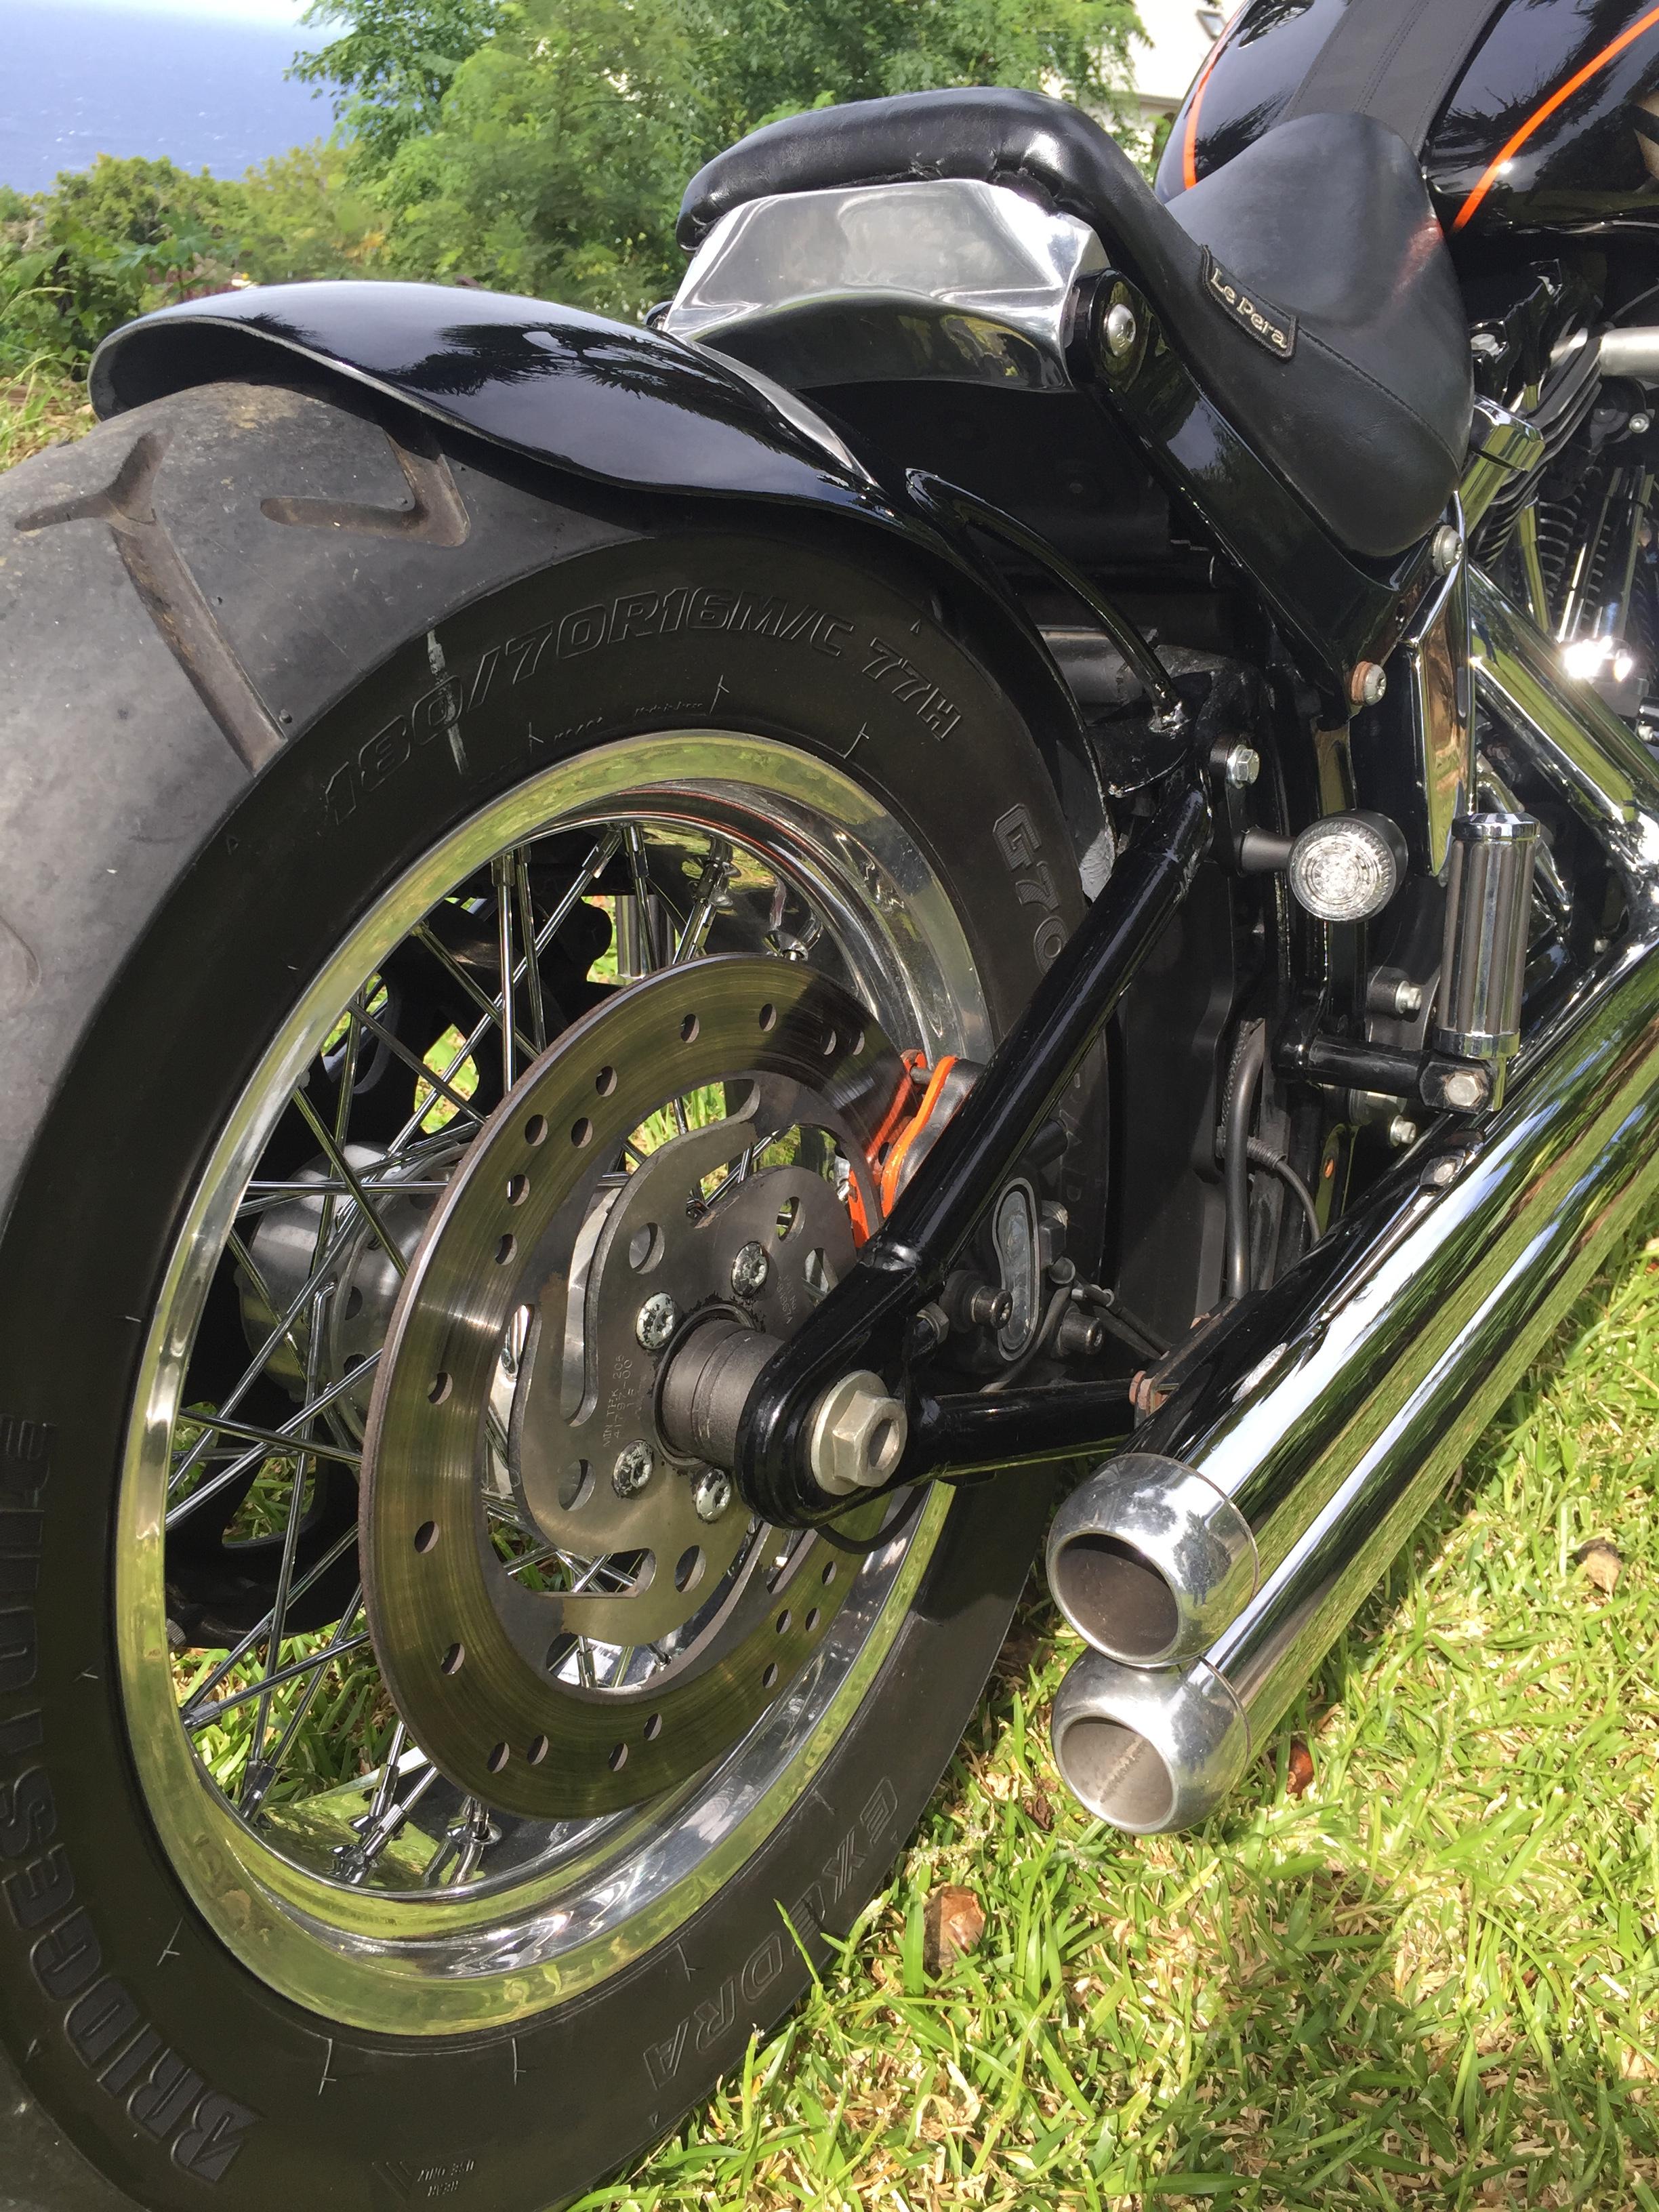 Moto Harley Davidson customisé par Run Iron Works